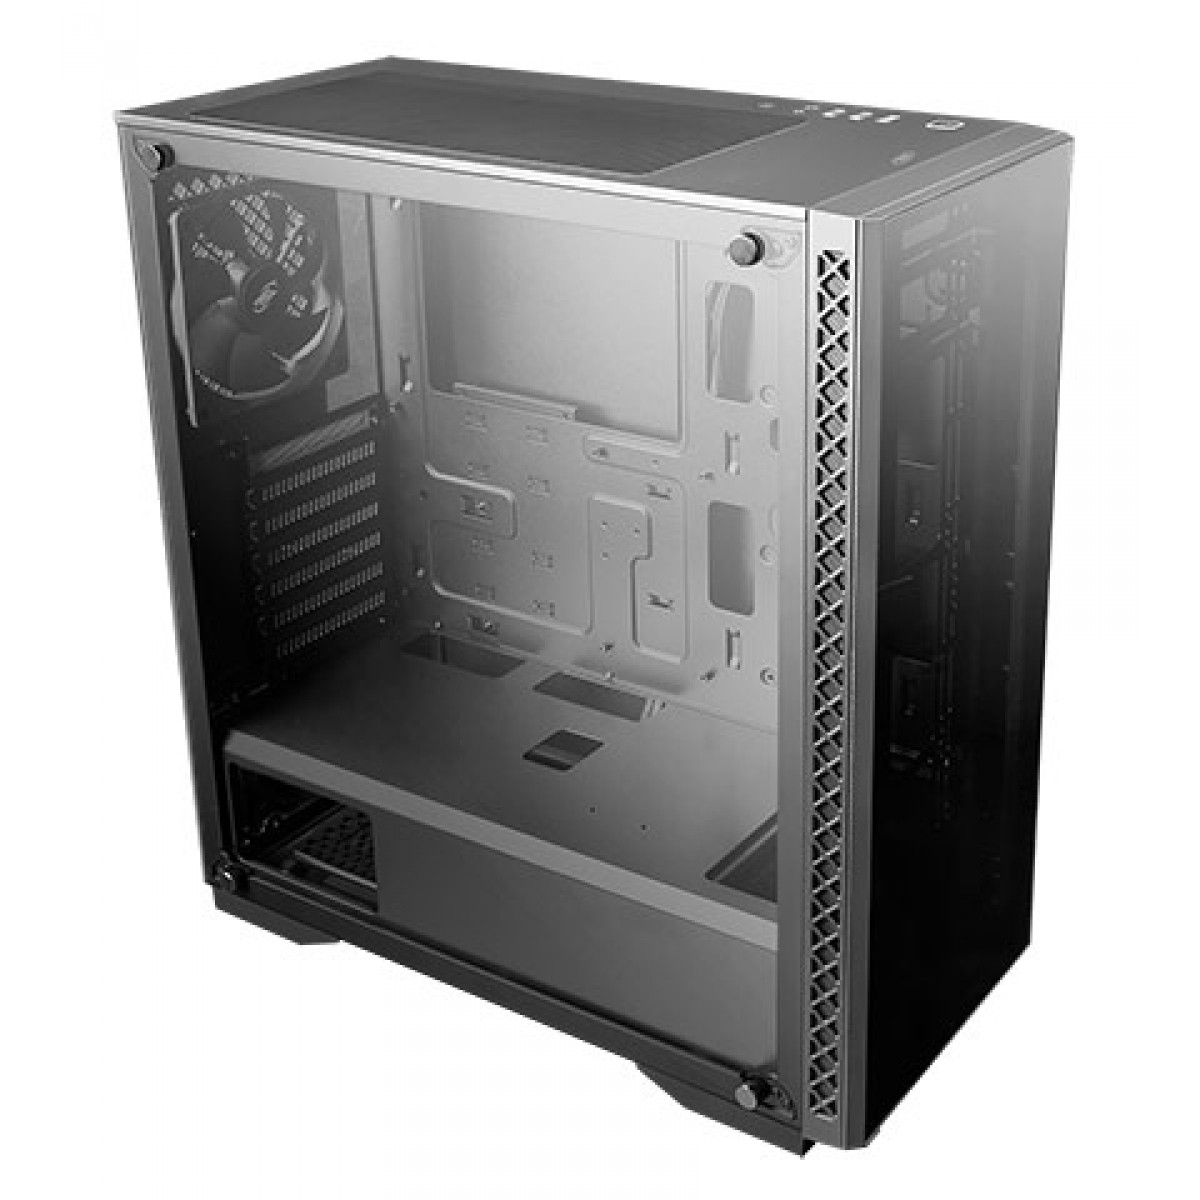 Gabinete Gamer DeepCool Matrexx 50, Mid Tower, ARGB, Vidro Temperado, Black, DP-ATX-MATREXX50-AR-3F-US, Sem Fonte, Com 3 Fans